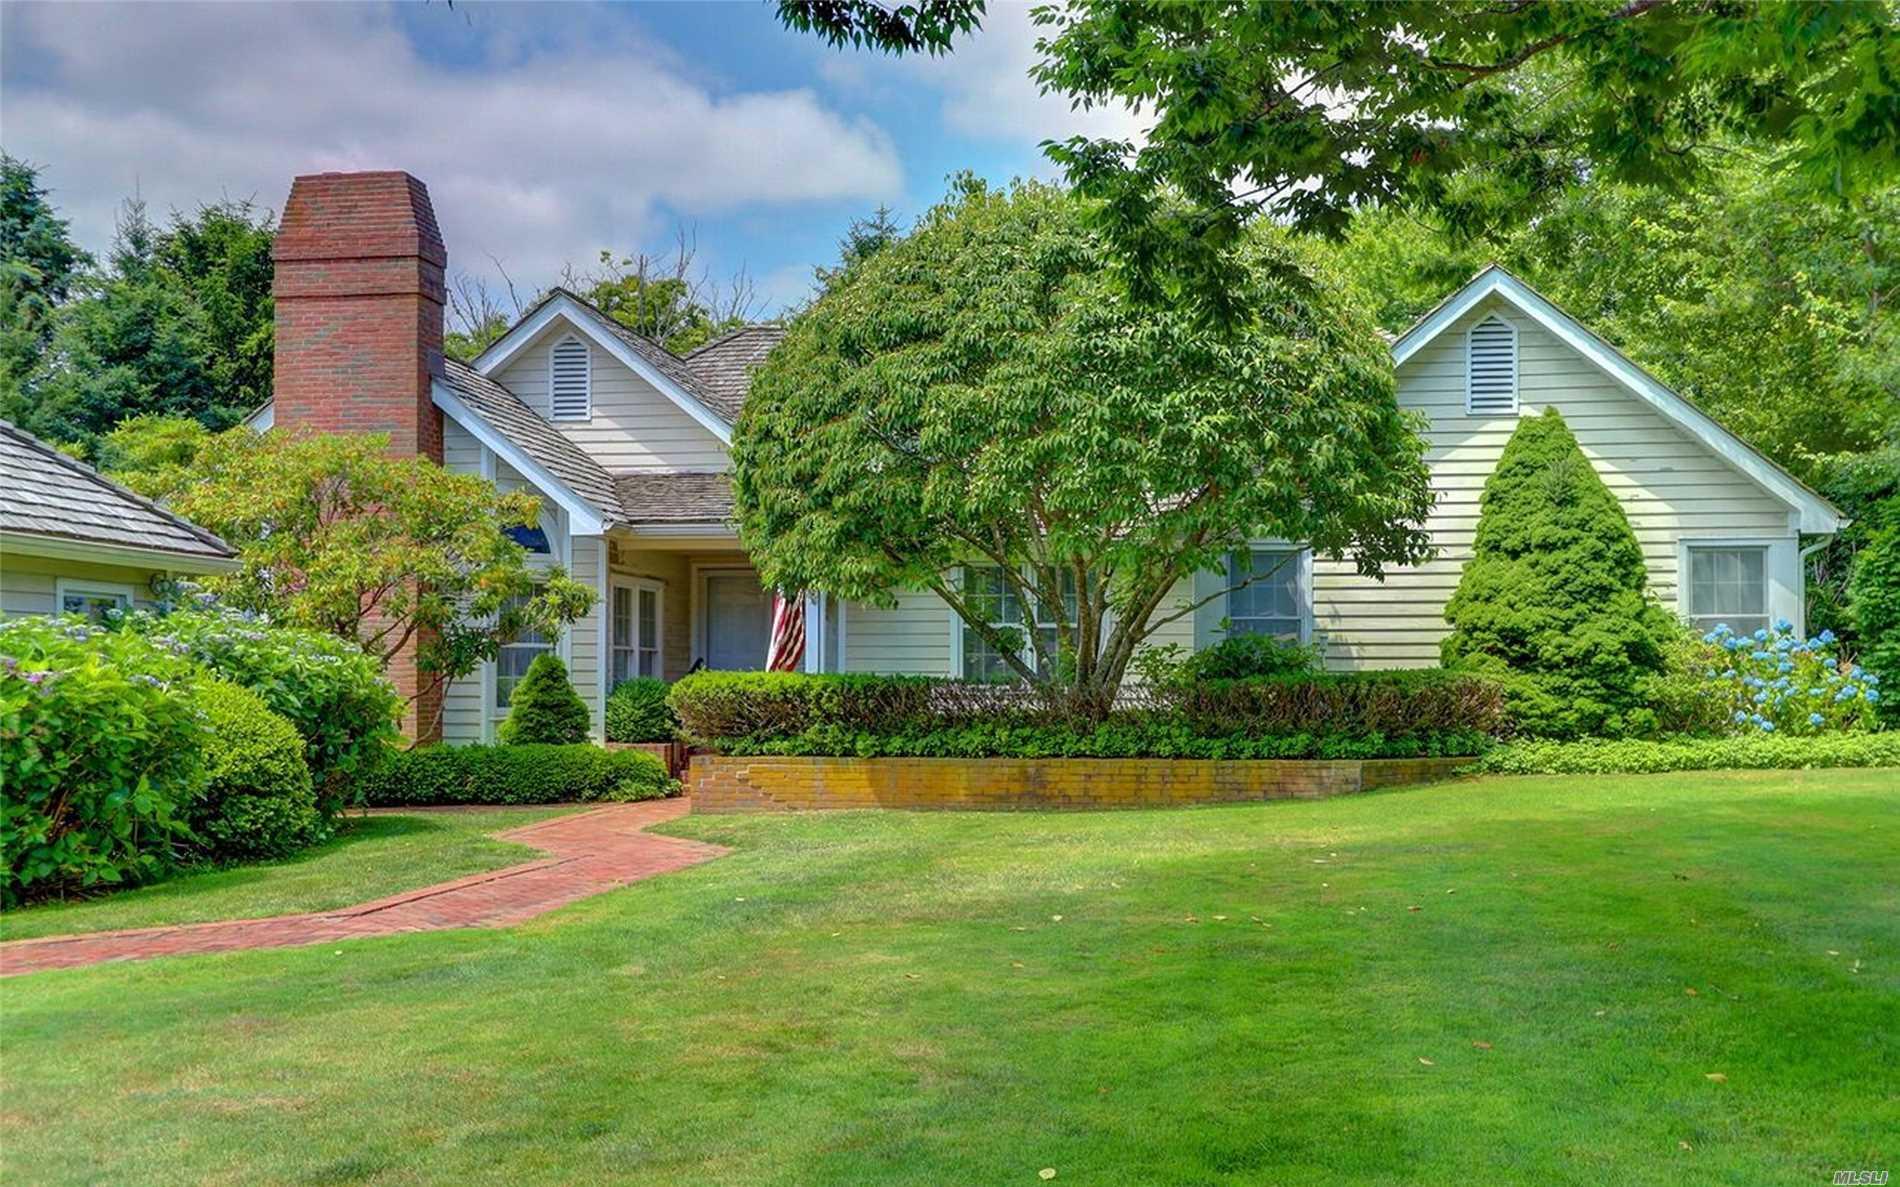 Property for sale at 12 Cobblefield Lane, Southampton NY 11968, Southampton,  New York 11968